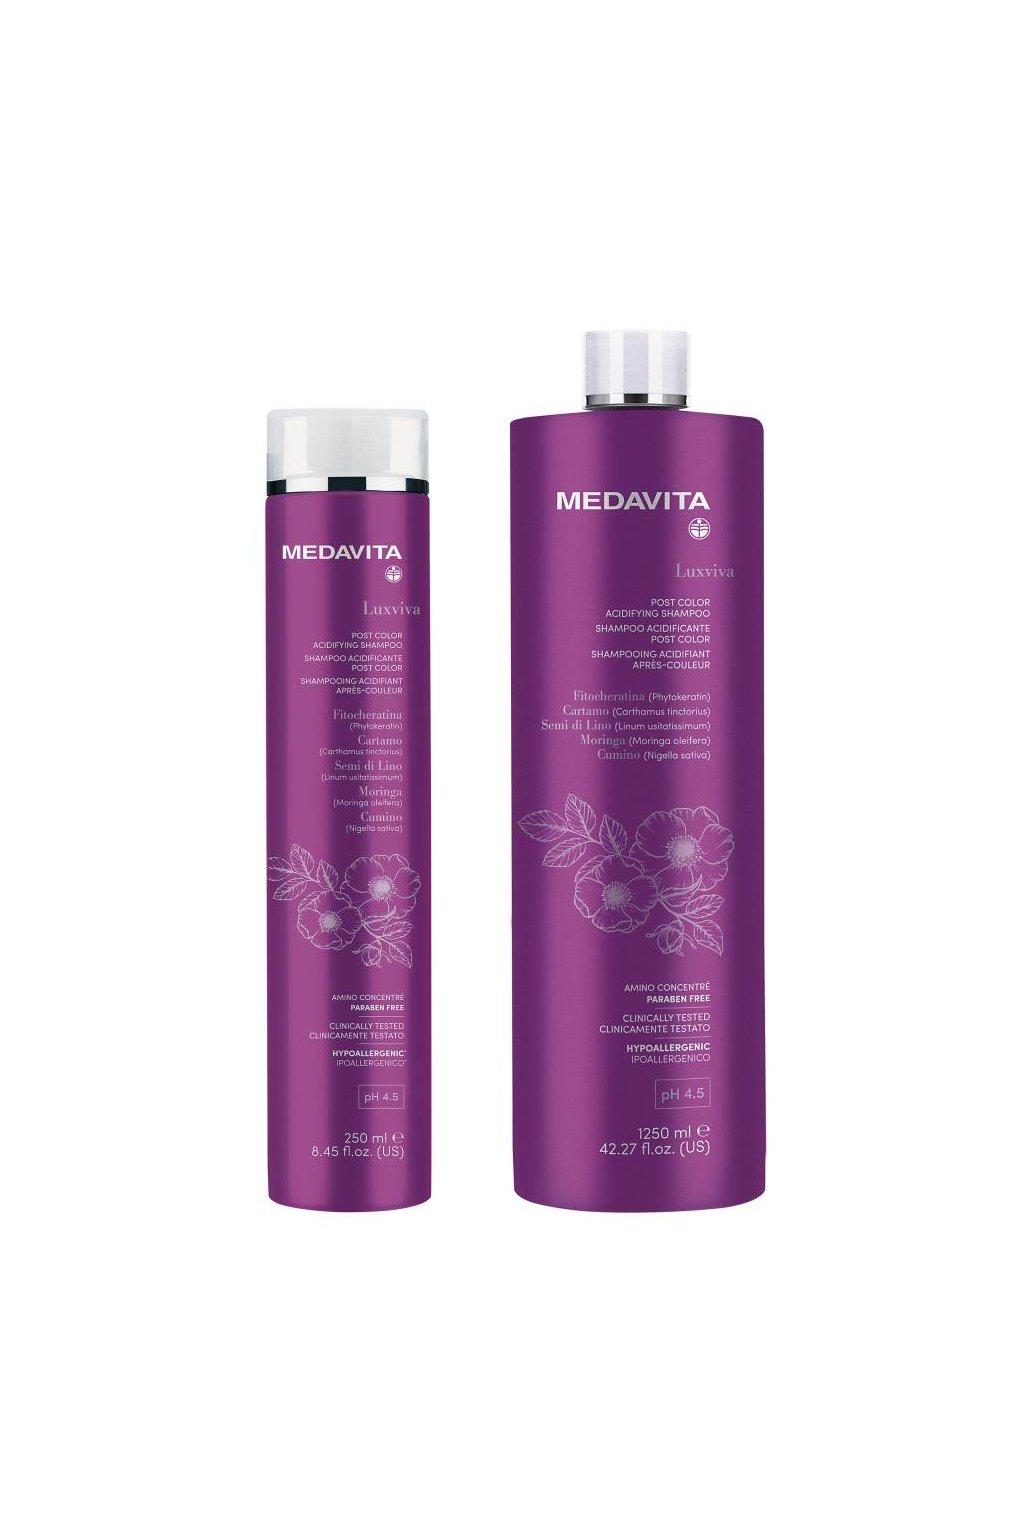 Medavita LUXVIVA Šampon Acid pro barvené vlasy s filtry UVA/UVB